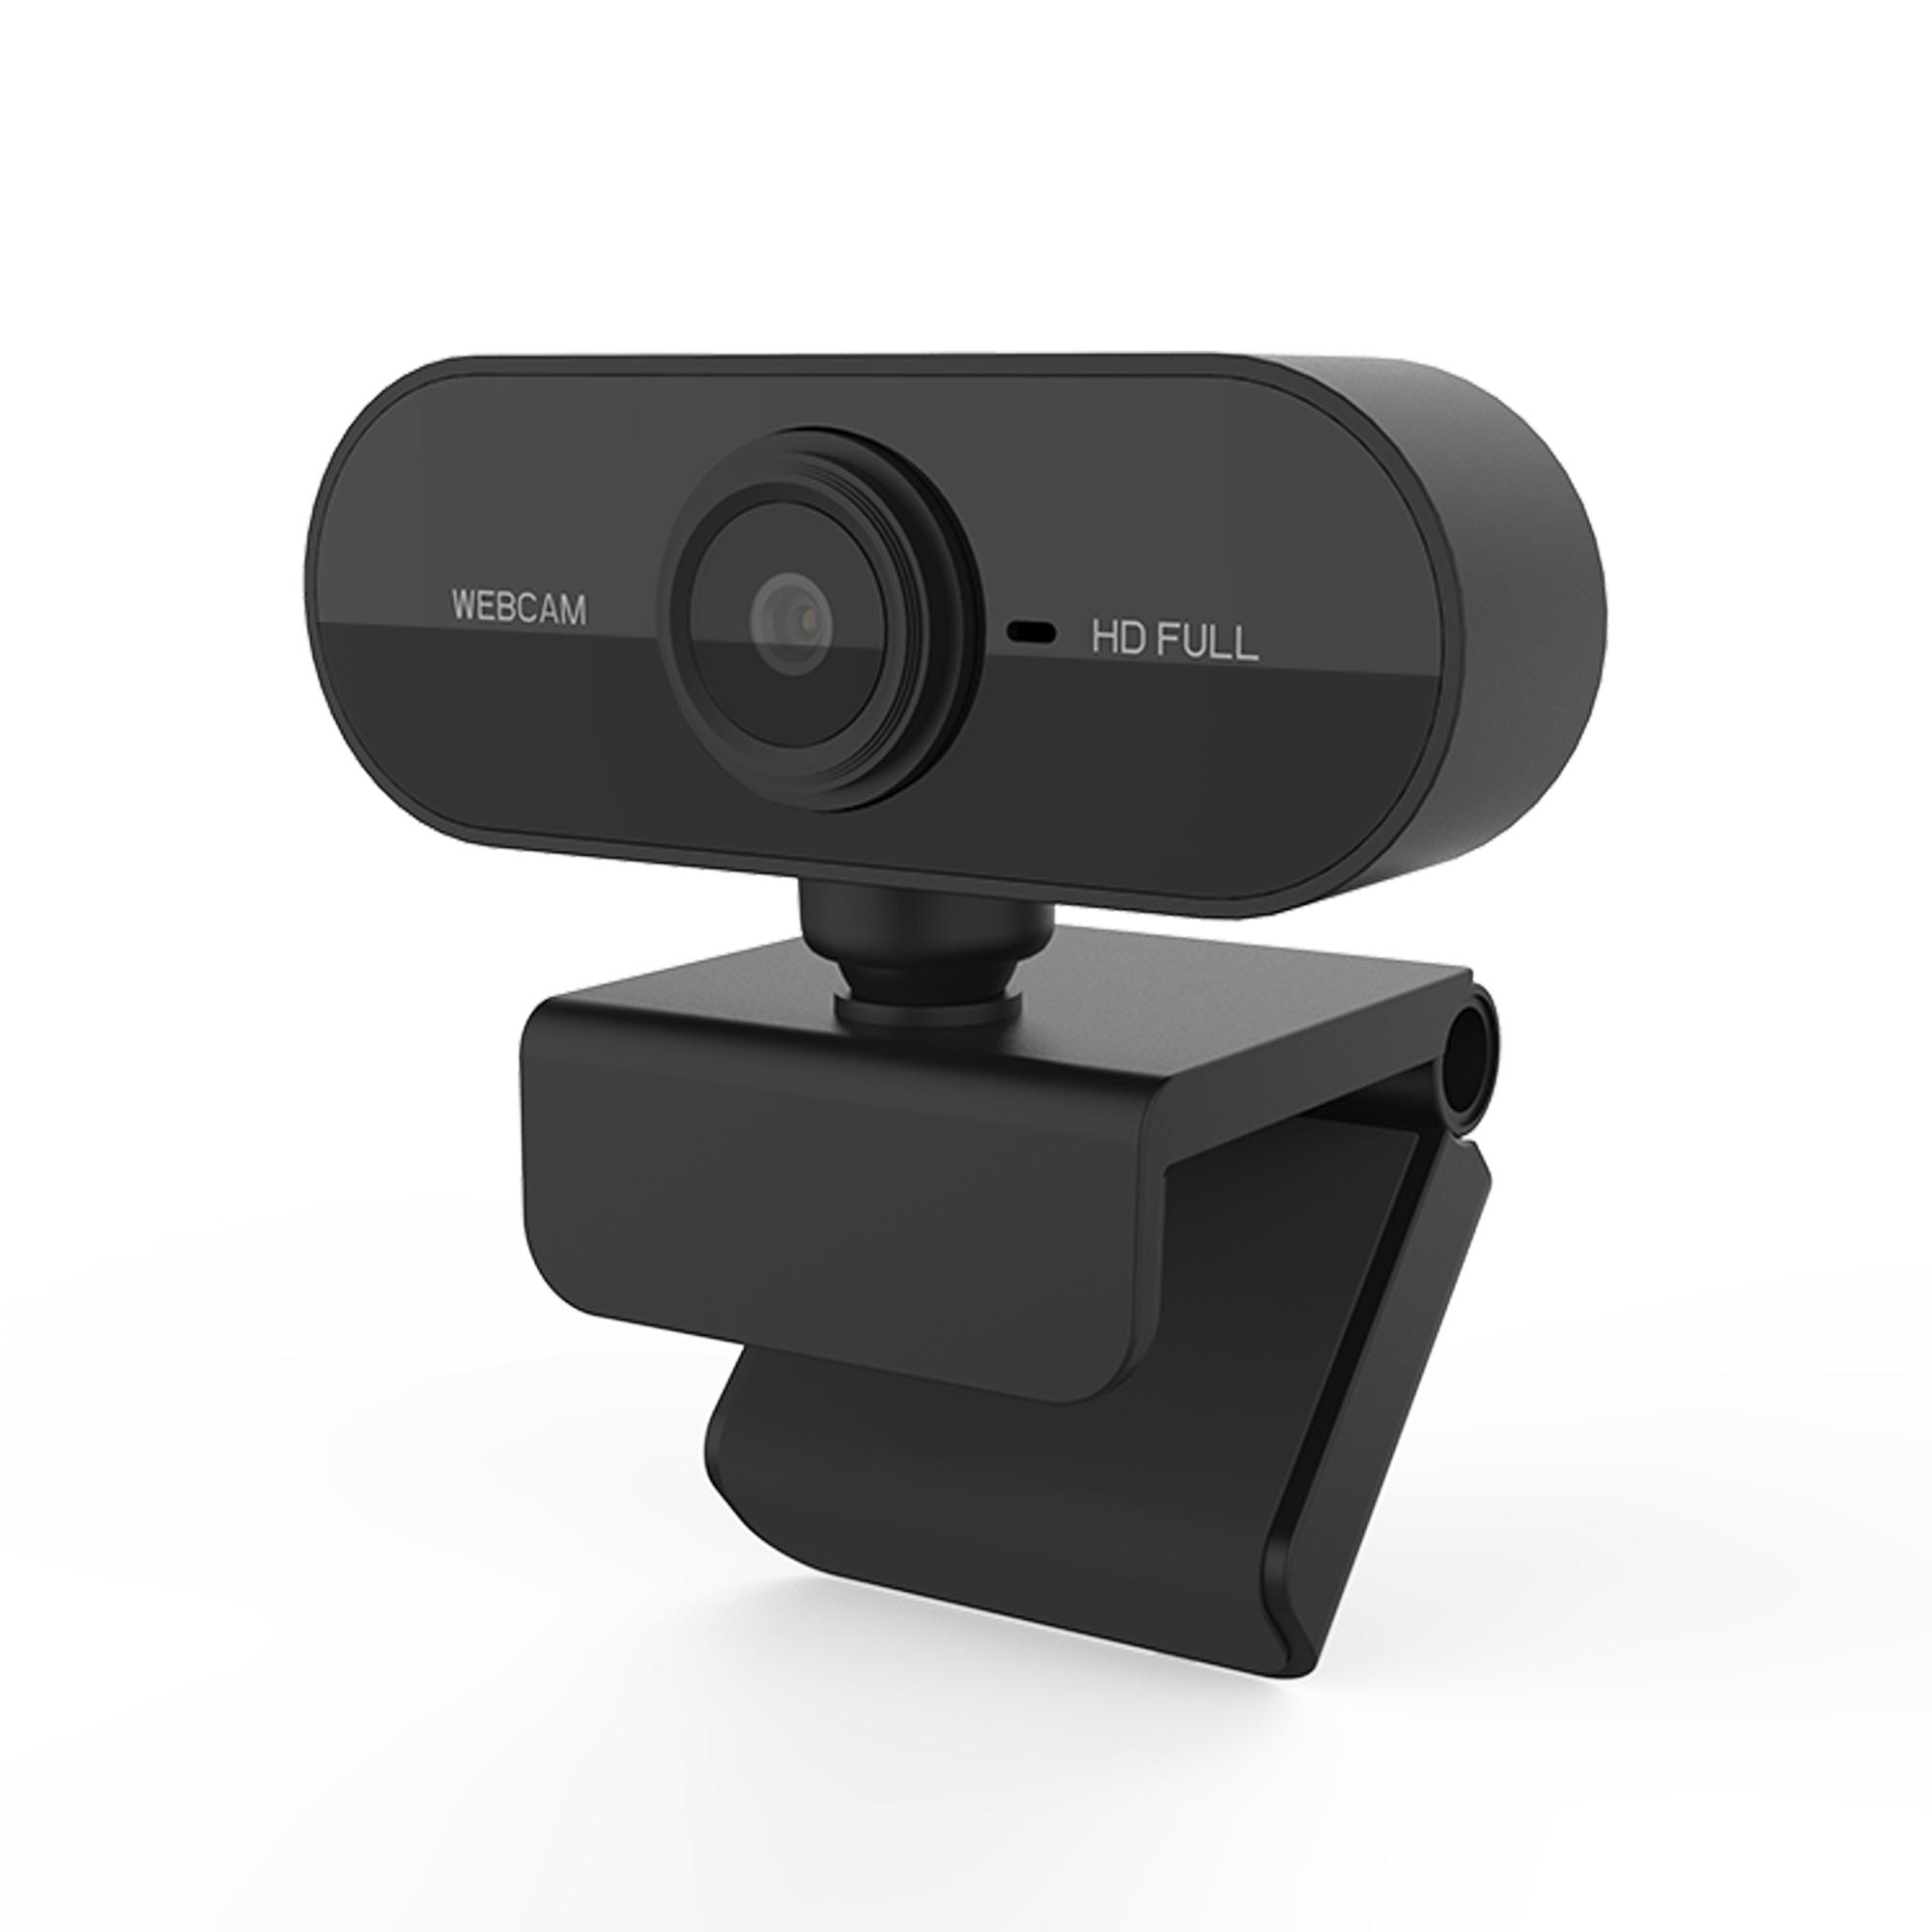 Webcam 1080P HDWeb Camera with Built-in HD Microphone 1920 x 1080p Web Cam black